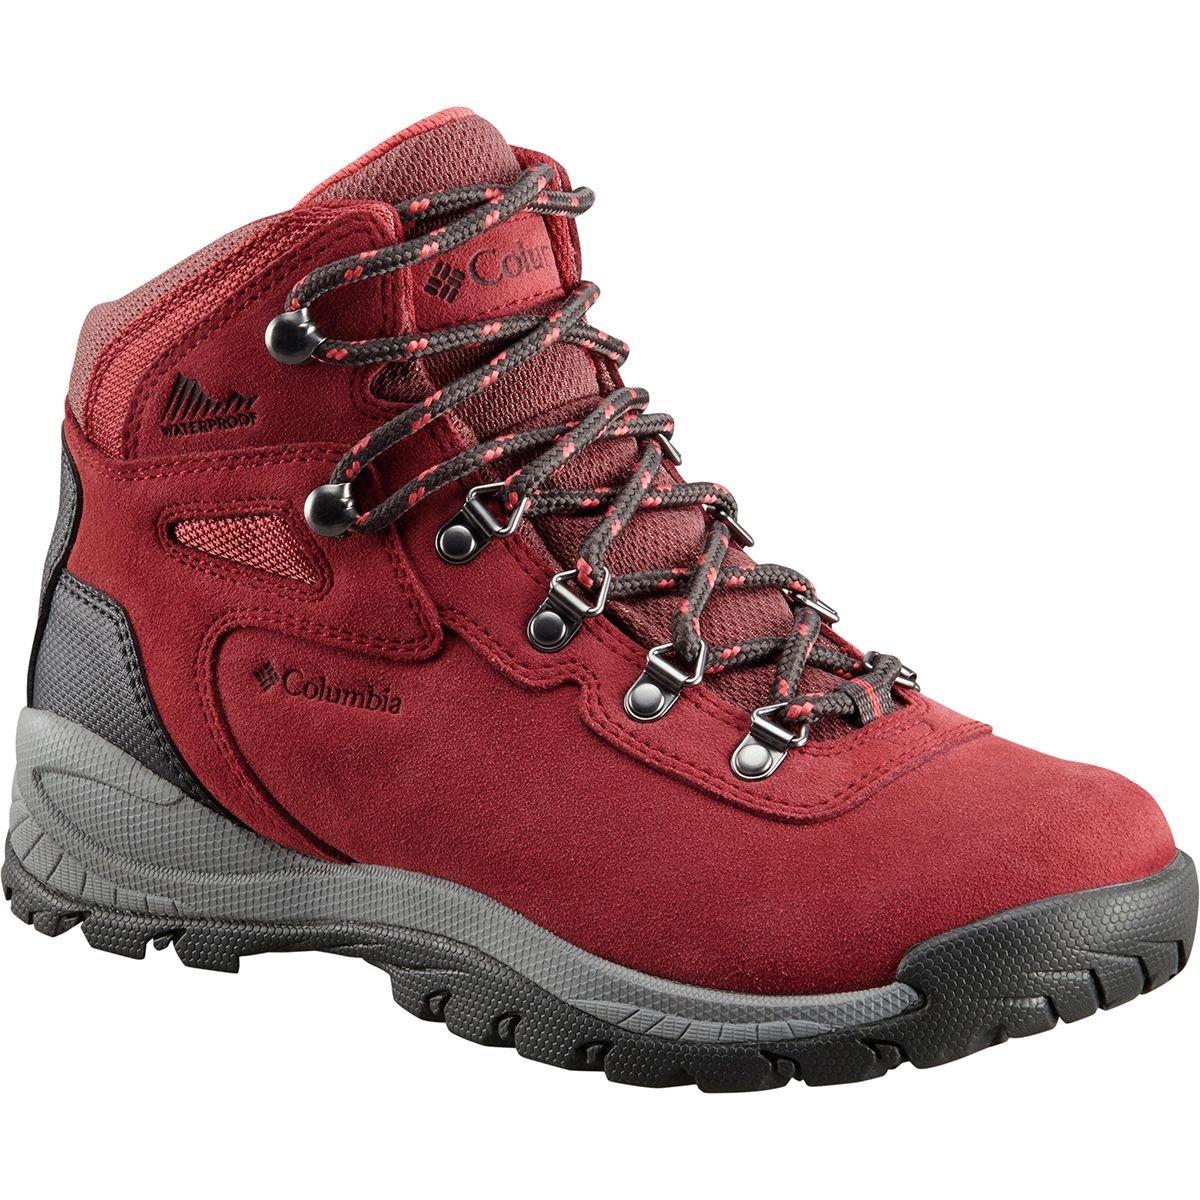 Columbia Women's Newton Ridge Plus Waterproof Amped Hiking Boot B0787KFYLF 6.5 B(M) US|Marsala Red, Sunset Red